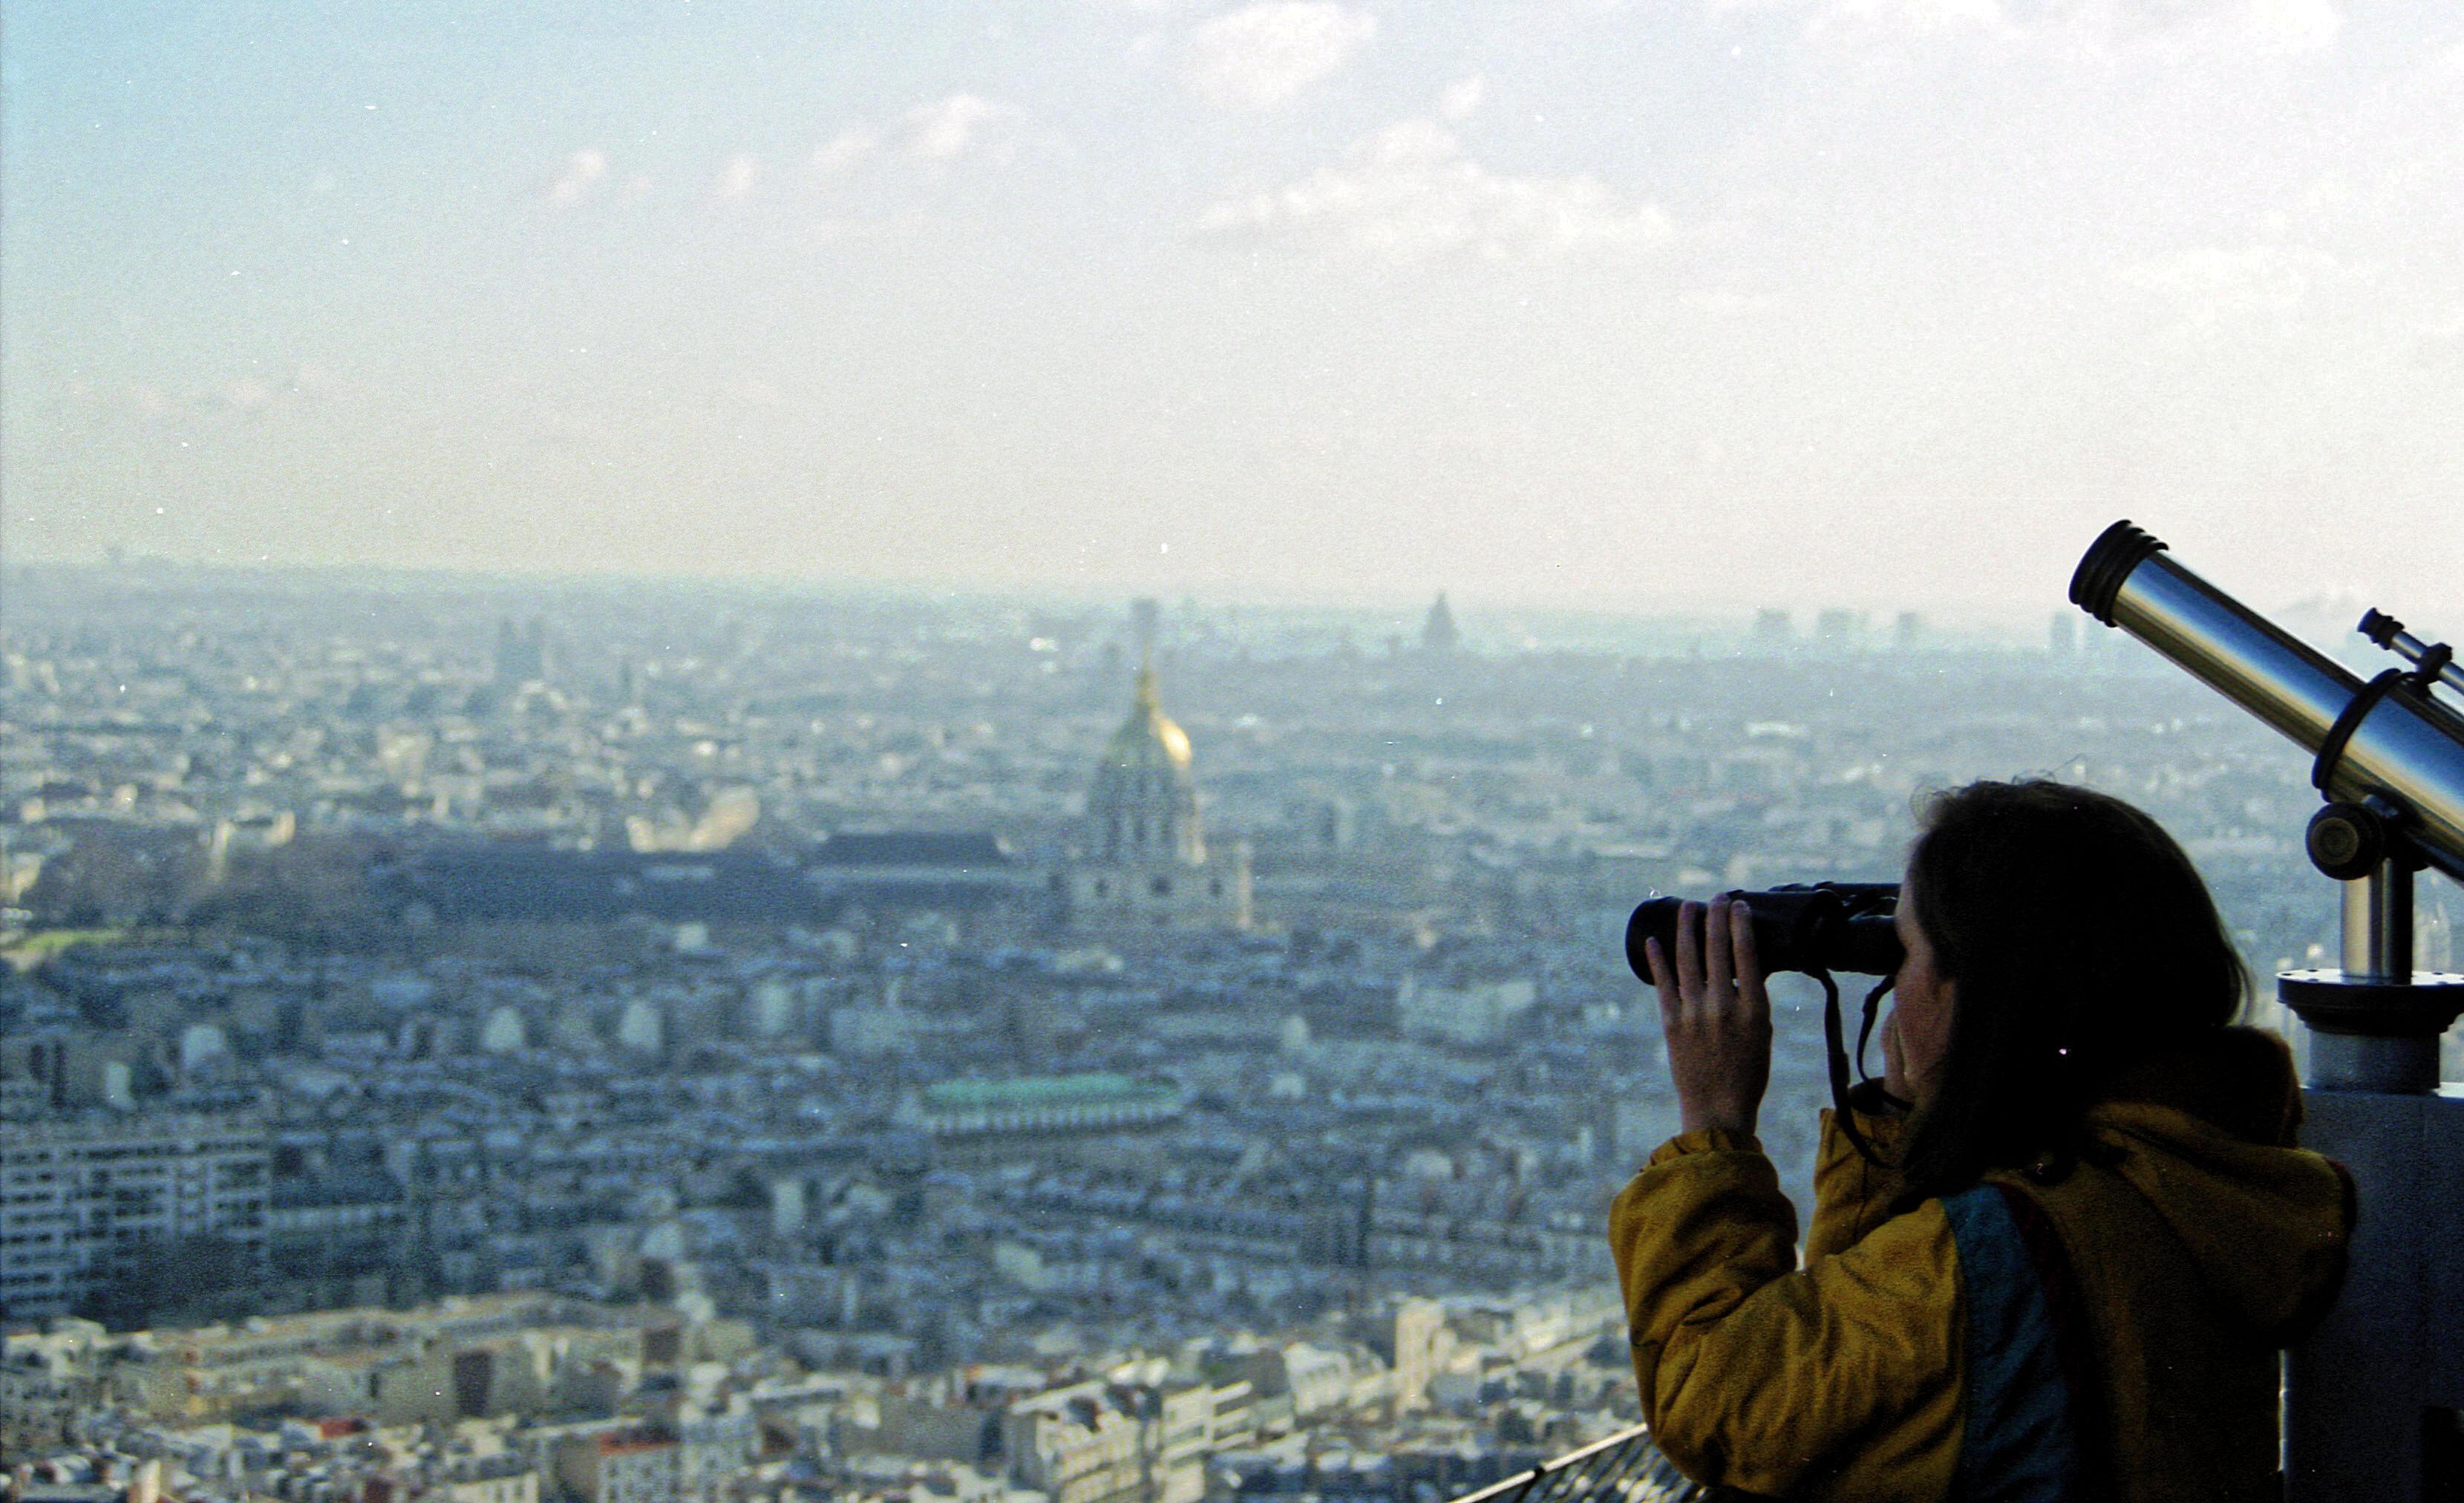 Tour-Eiffel-1.jpeg